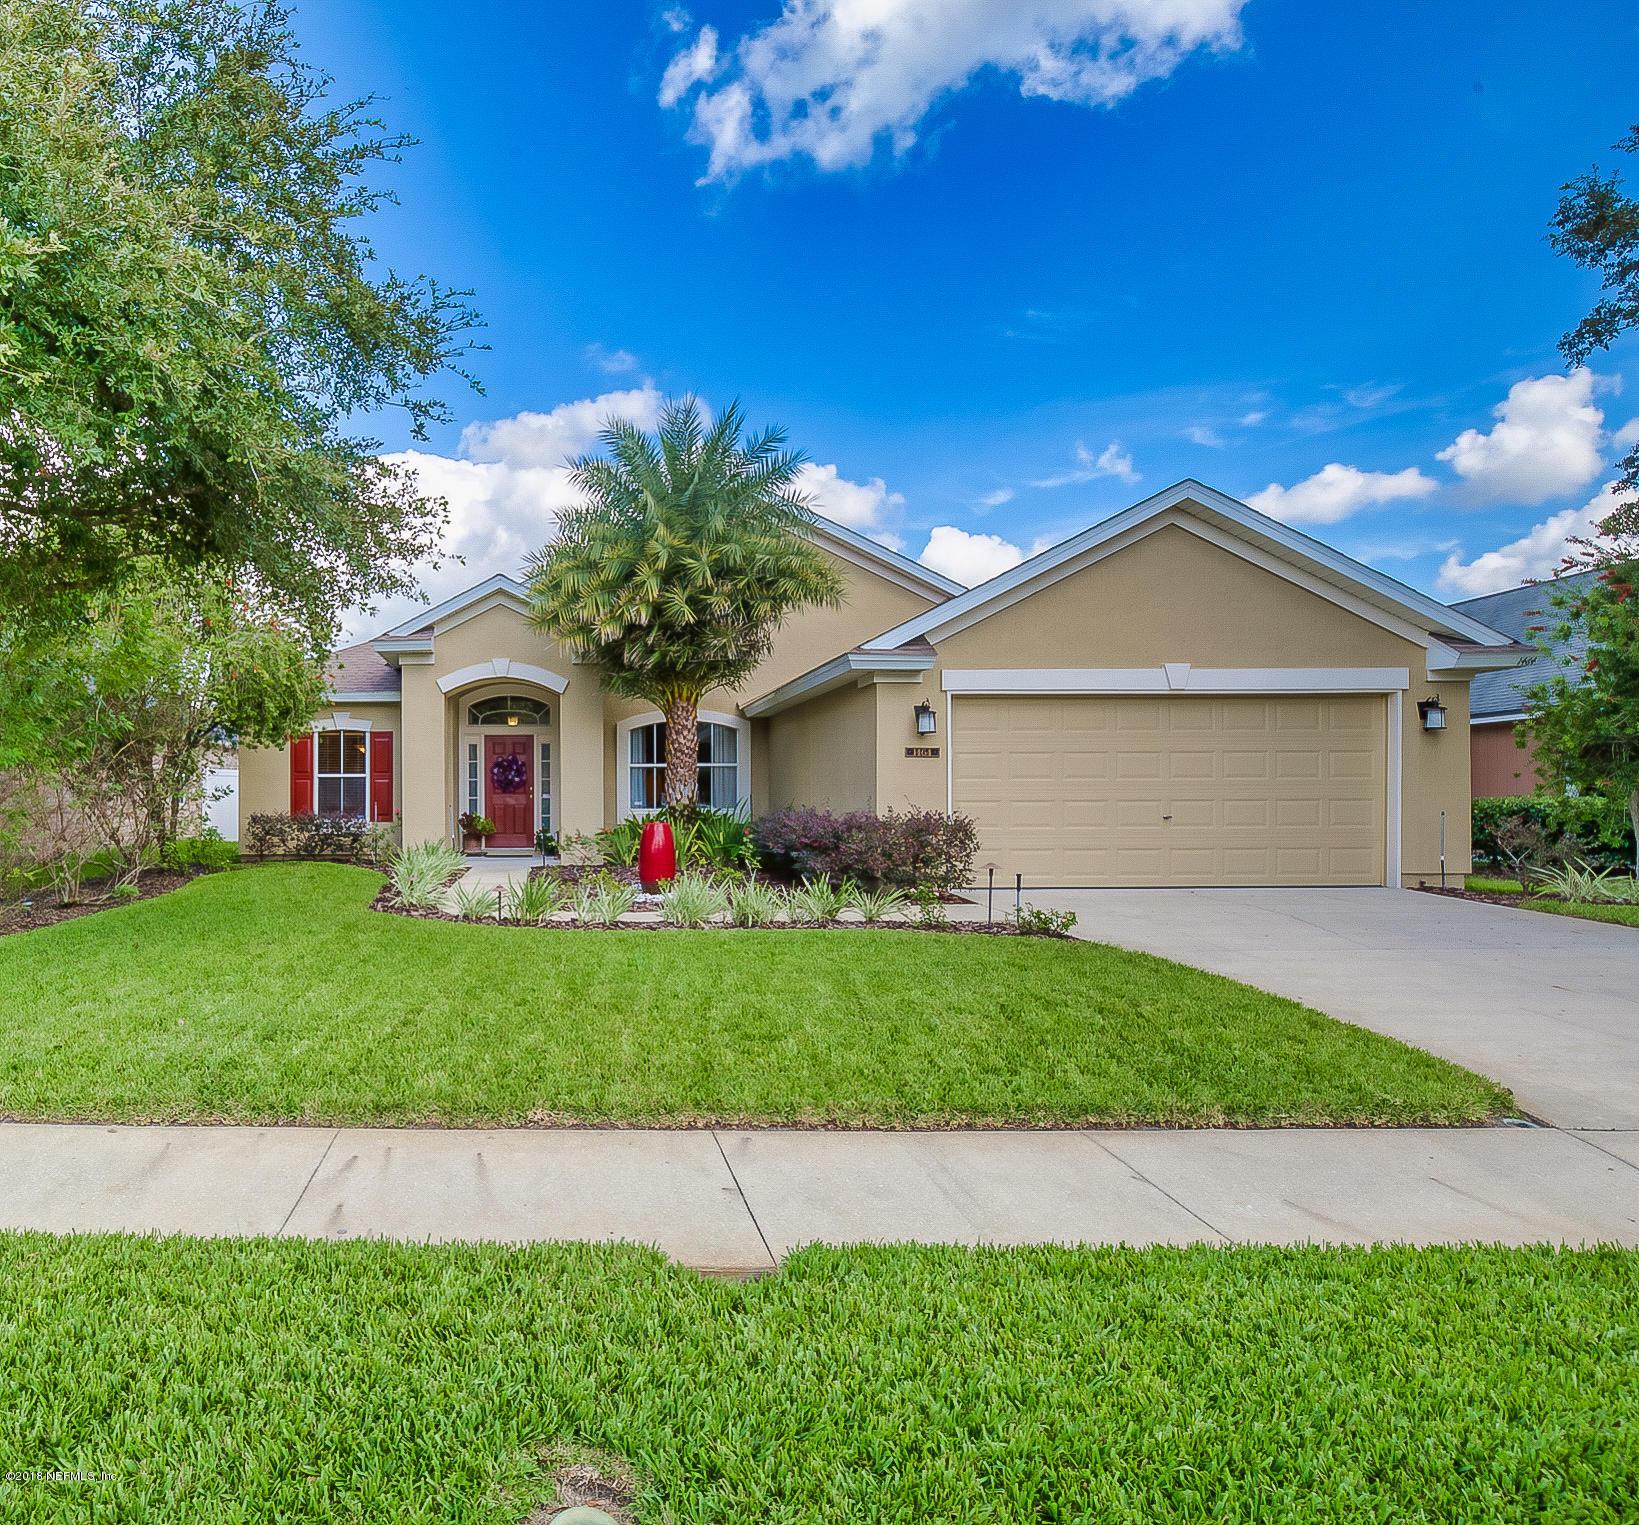 1464 CANOPY OAKS, ORANGE PARK, FLORIDA 32065, 3 Bedrooms Bedrooms, ,2 BathroomsBathrooms,Residential - single family,For sale,CANOPY OAKS,963477